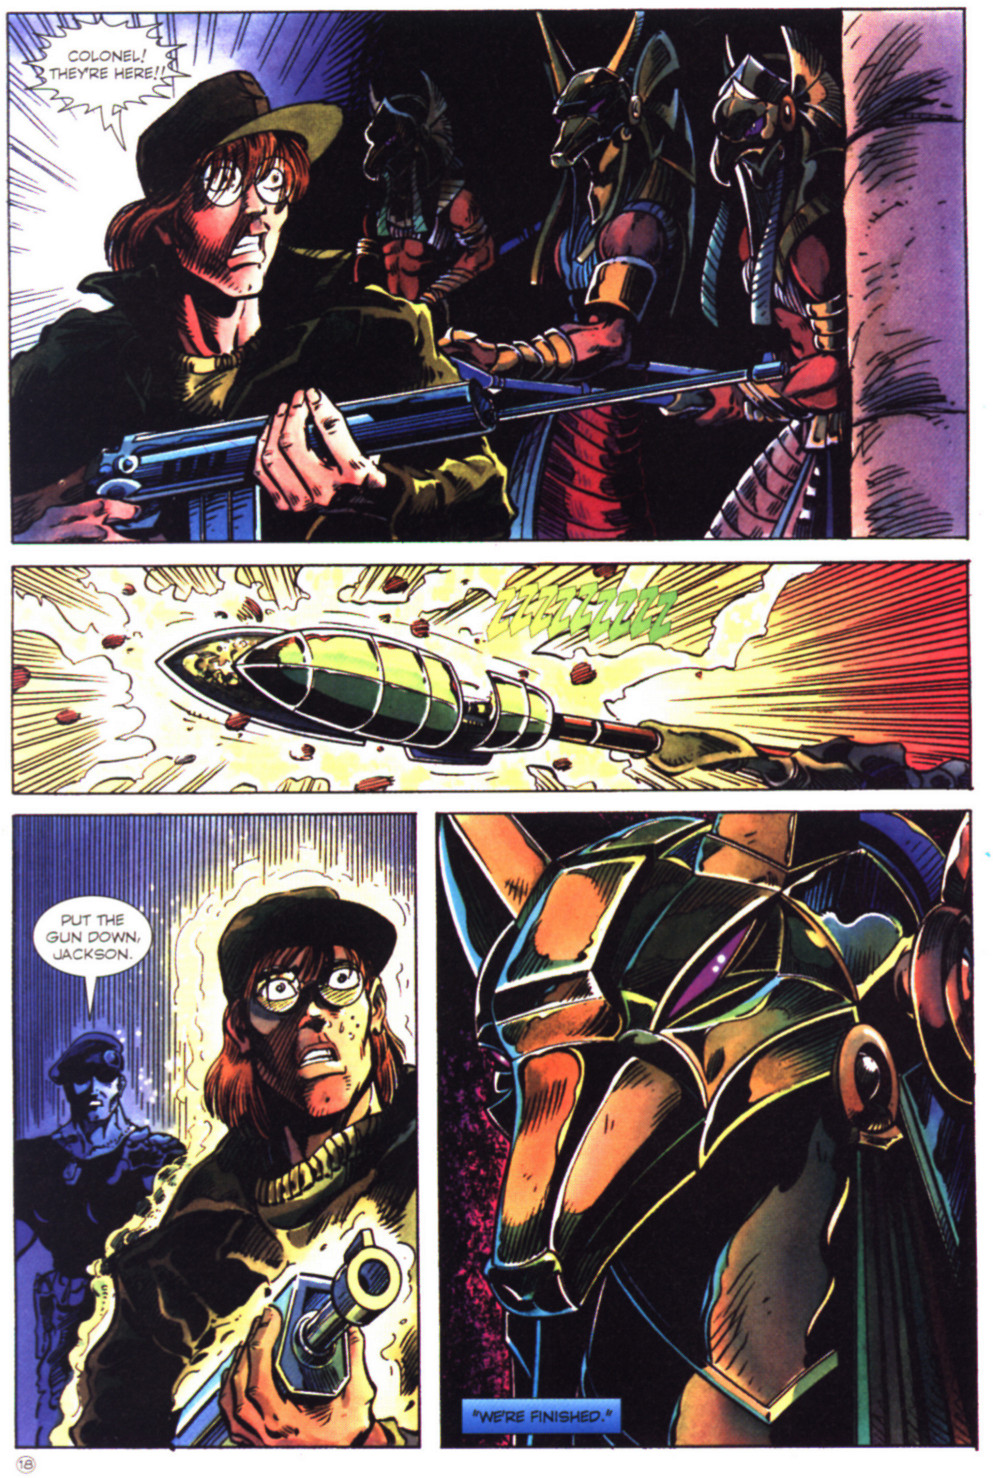 Read online Stargate comic -  Issue #2 - 20